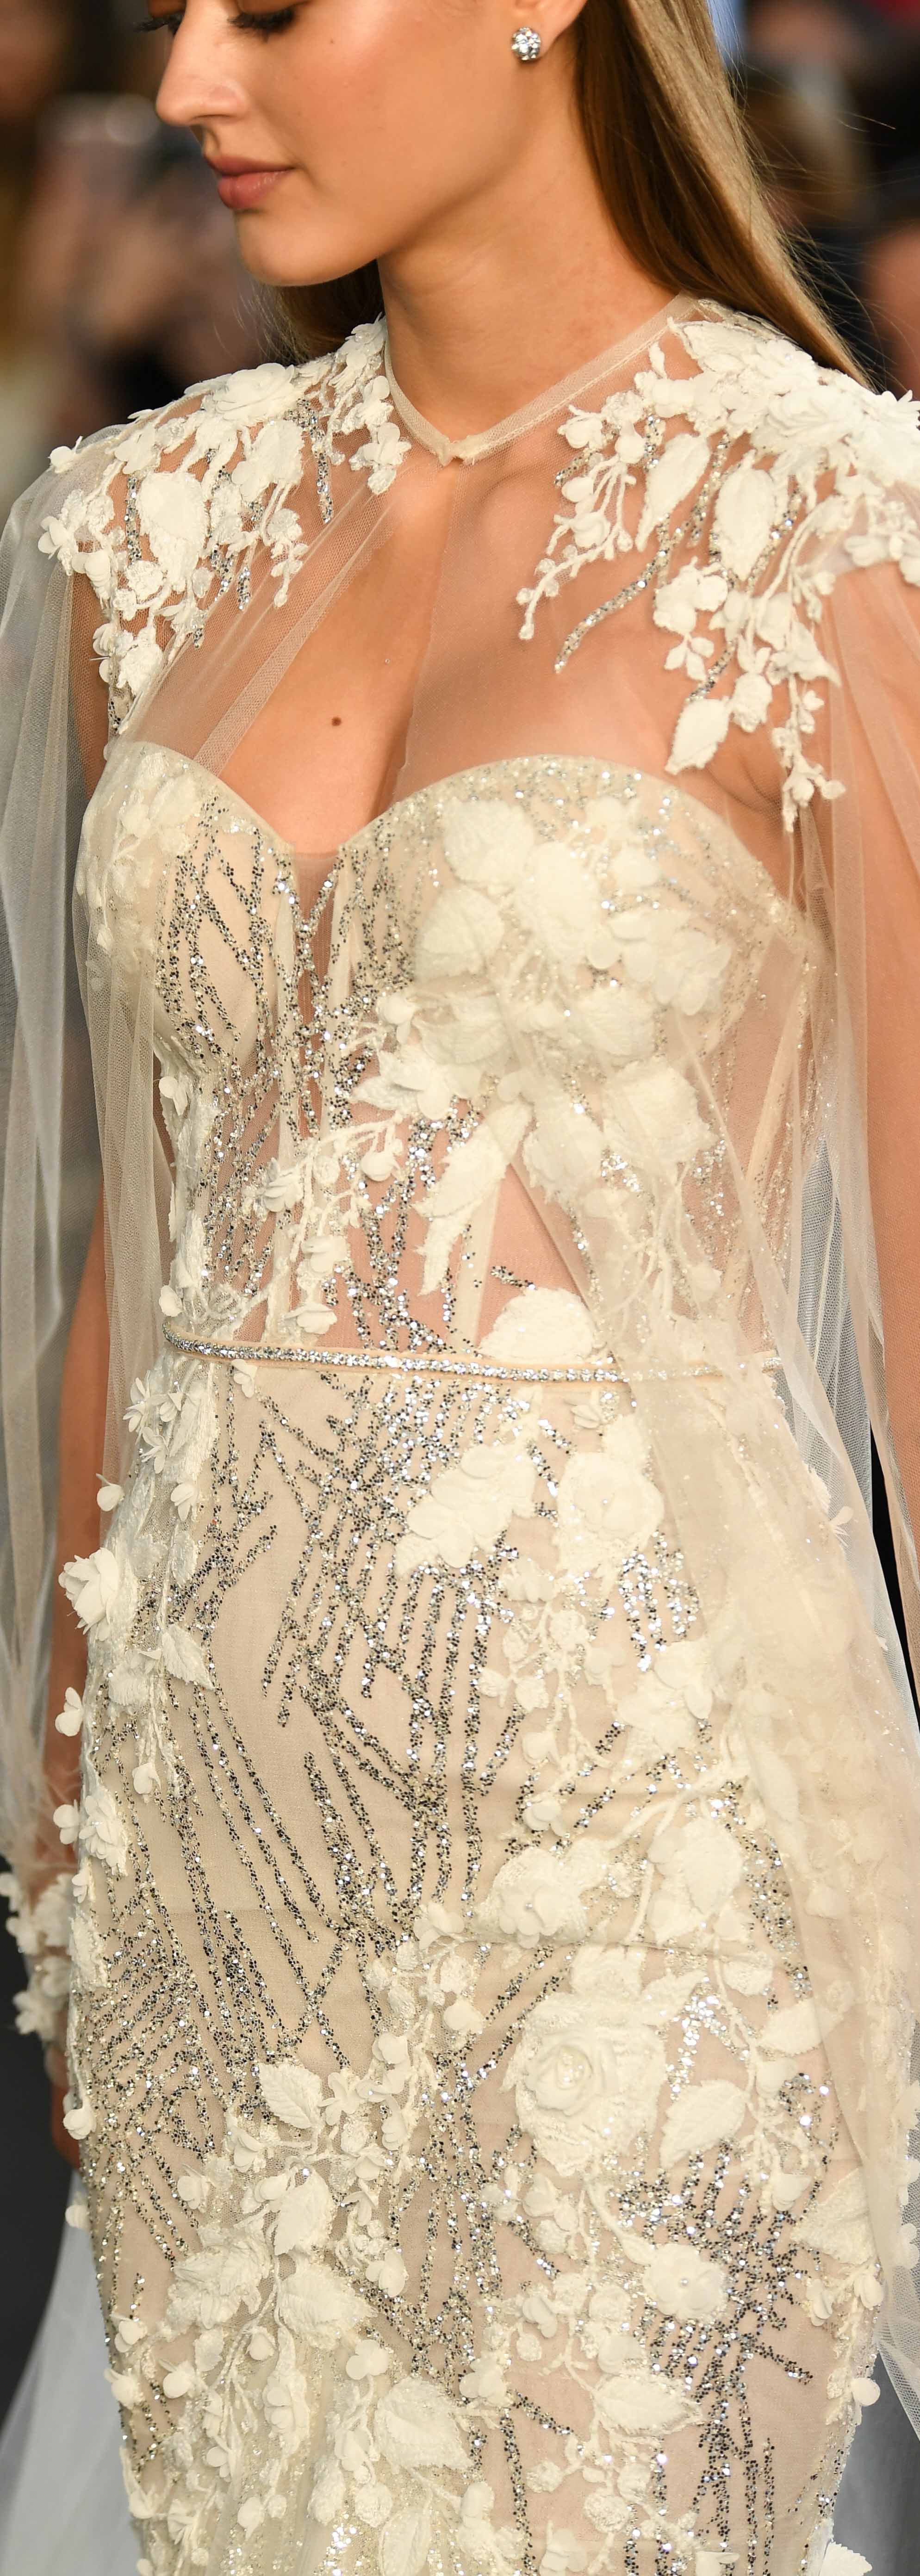 Wedding dress short in front with long train  Pin by BERTA on BERTA Events u Runways  Pinterest  Runway Wedding